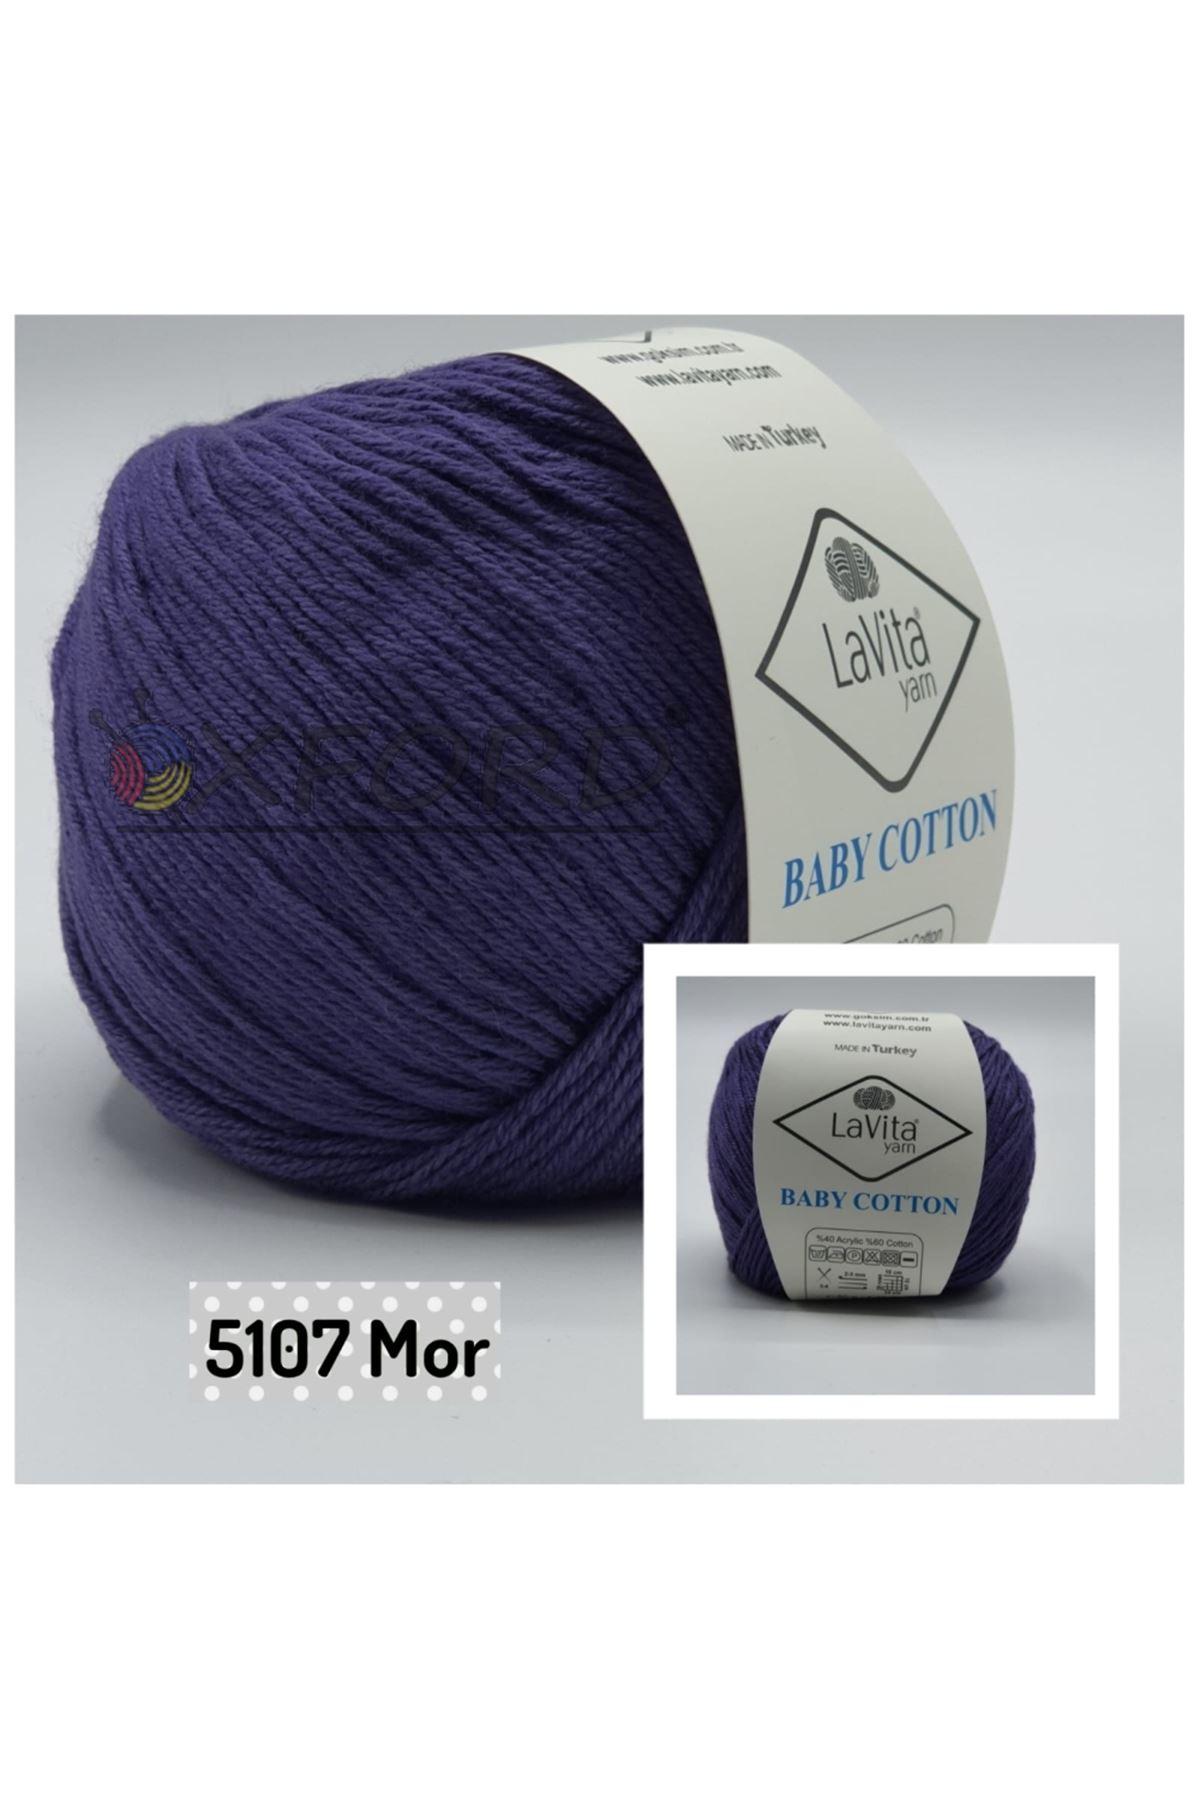 Lavita Baby Cotton 5107 Mor